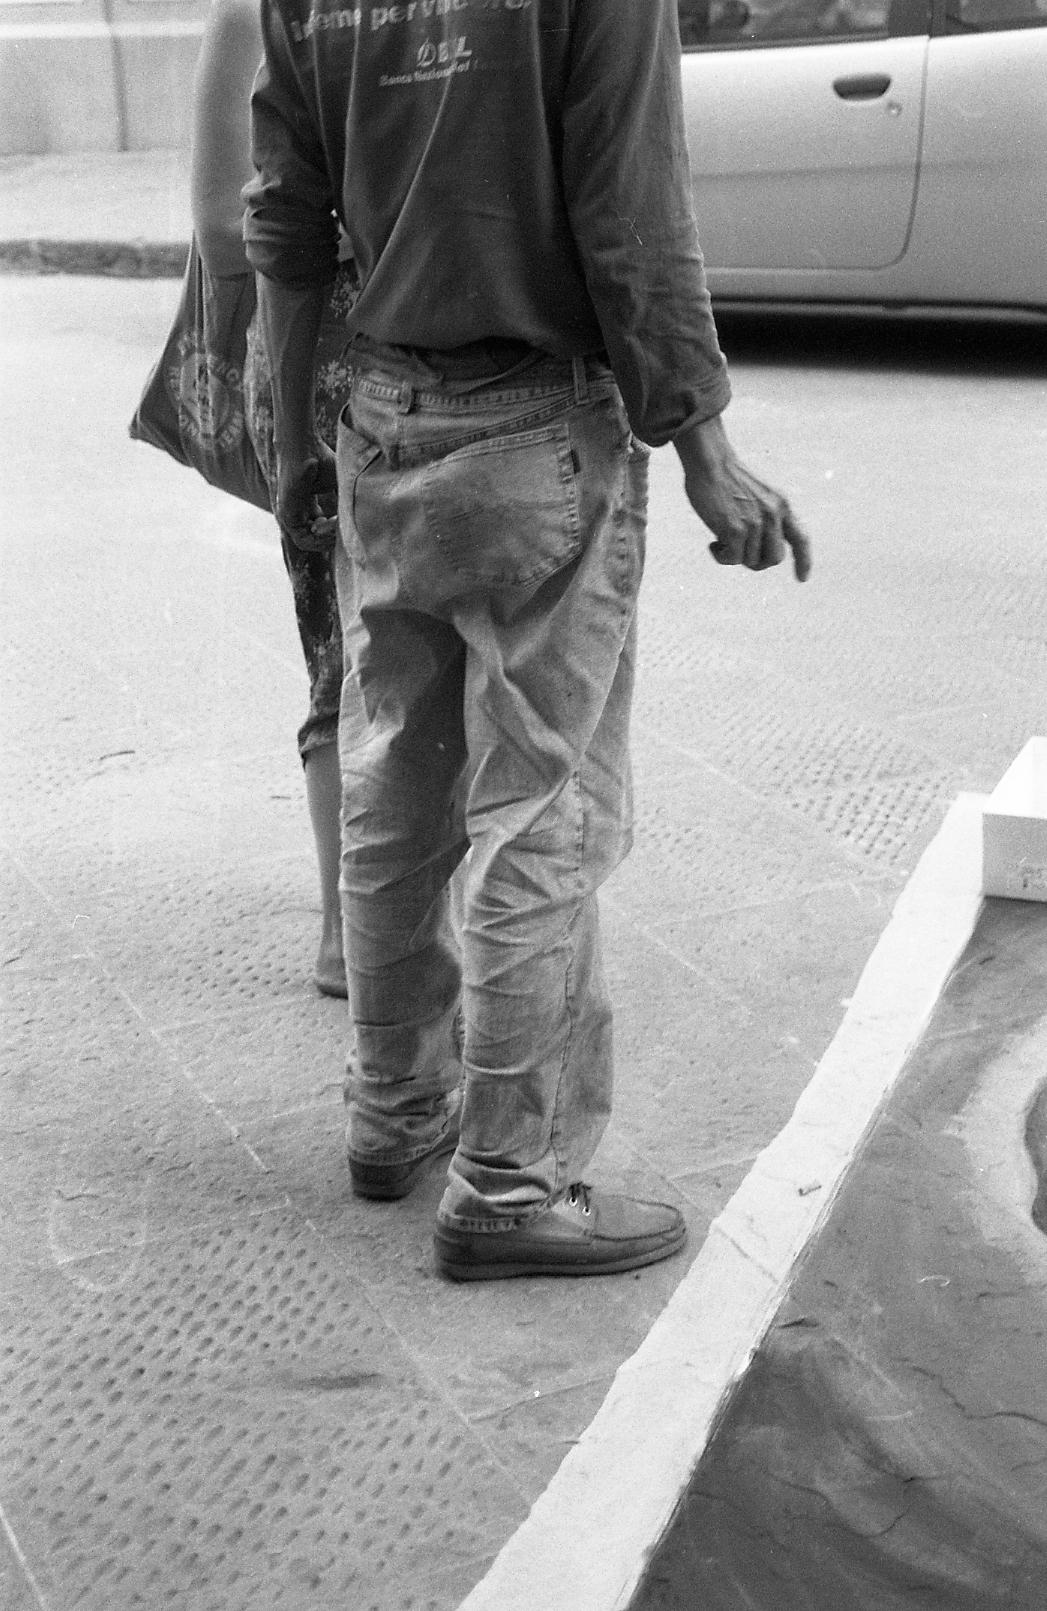 street painter. 35mm film.